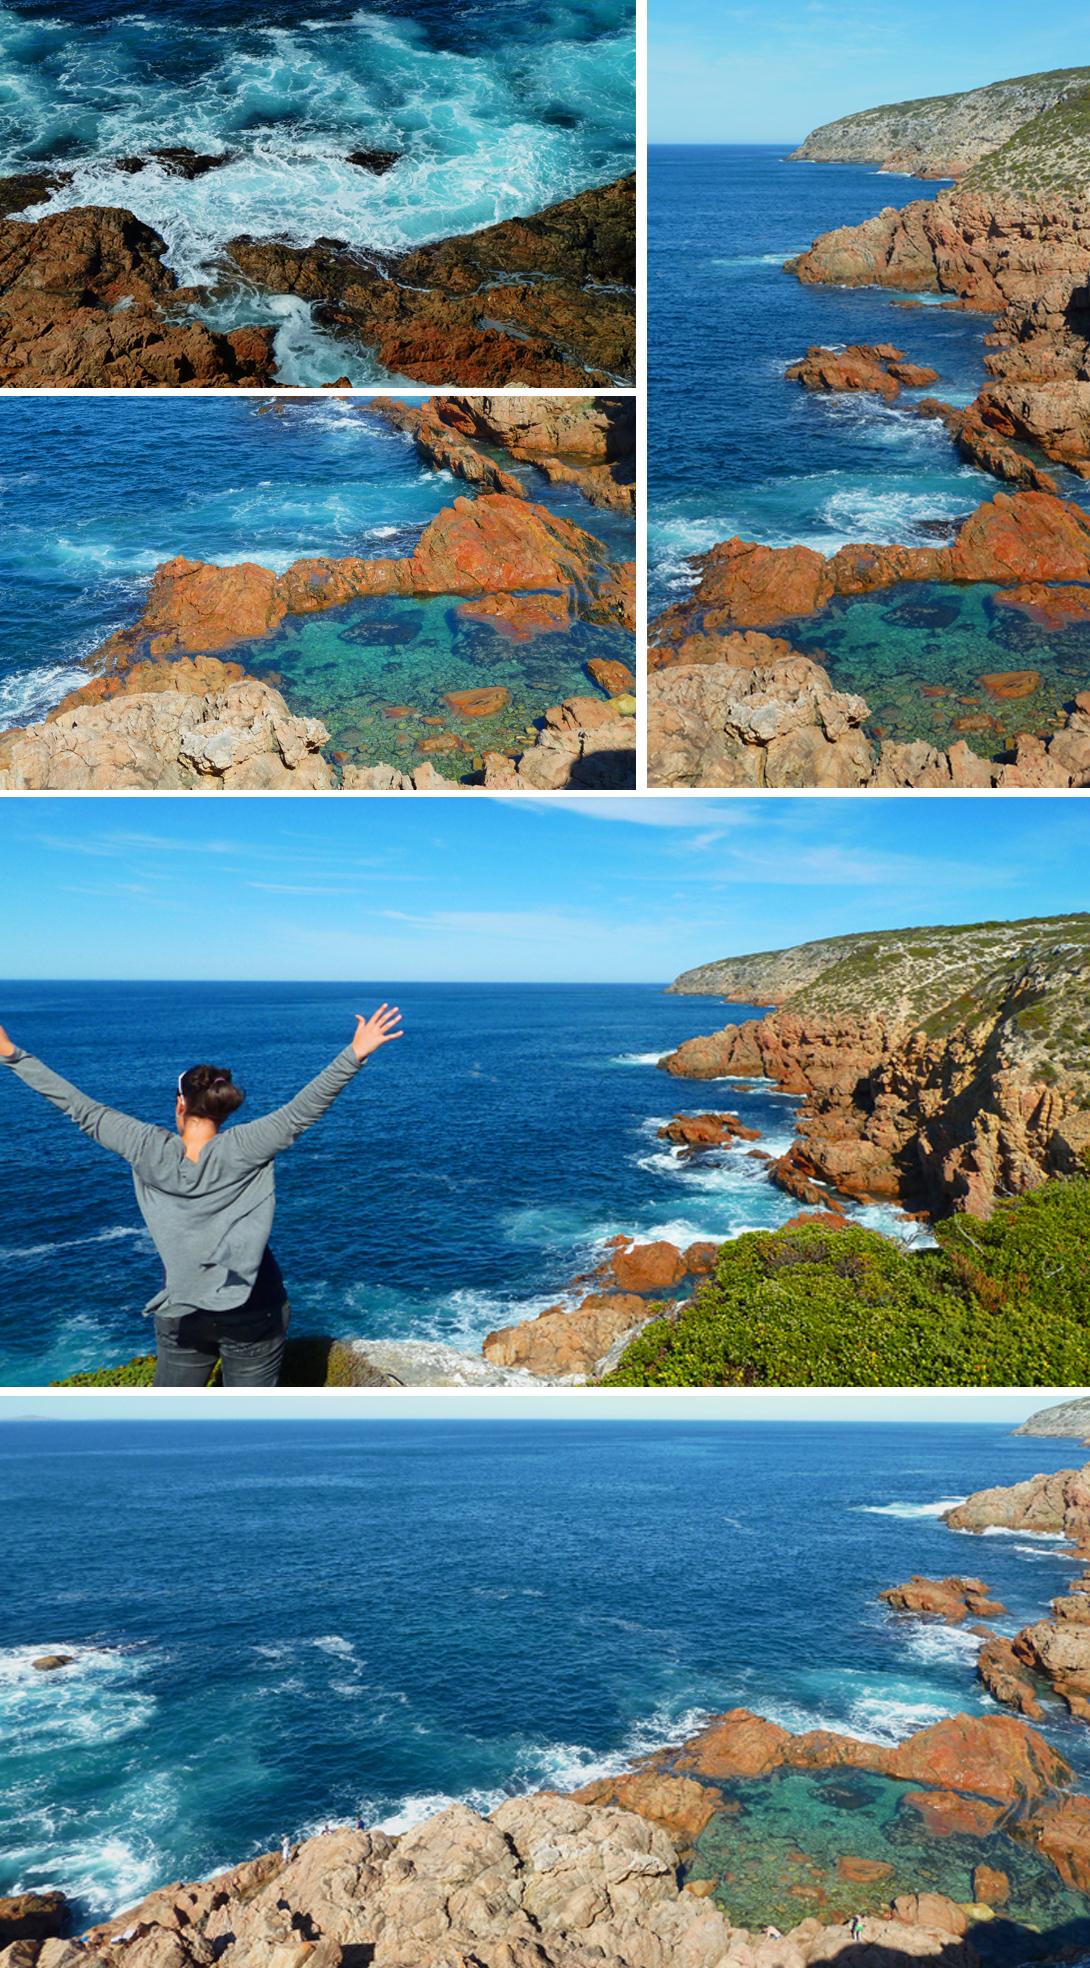 Swimmin' Hole, Whalers Way, South Australia